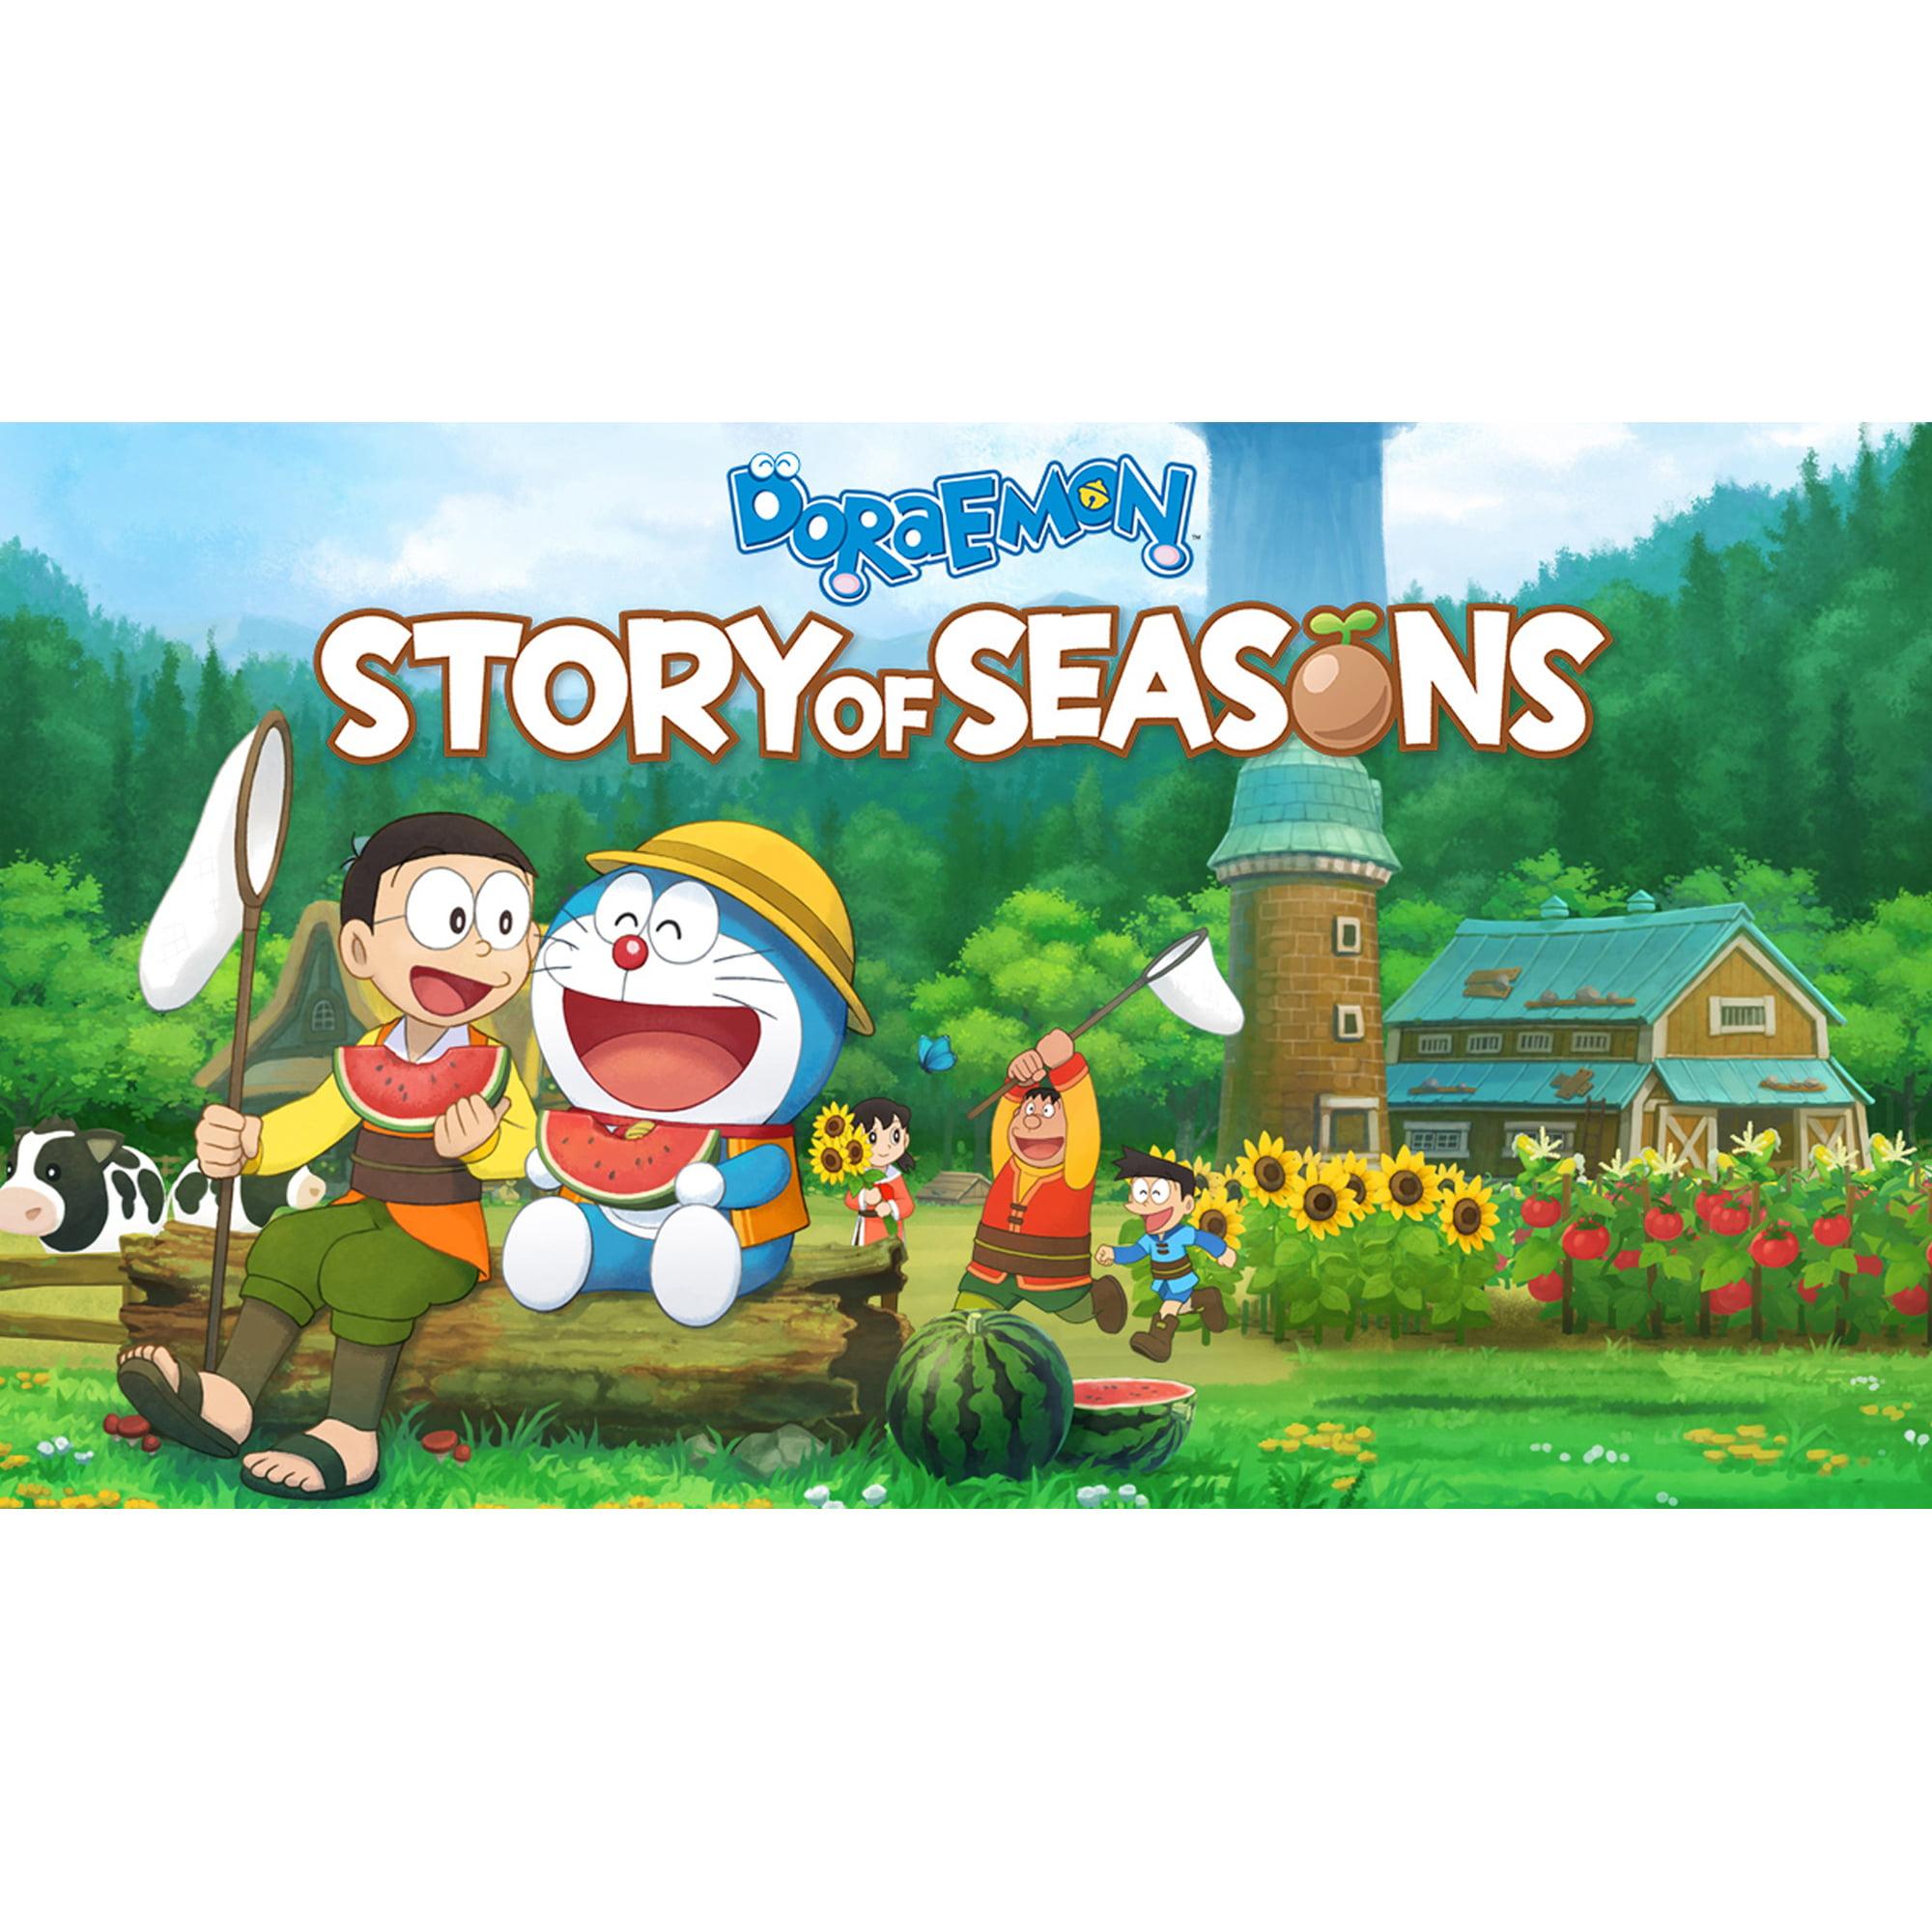 Doraemon Story Of Seasons Bandai Namco Entertainment Nintendo Switch Digital Download 045496665708 Walmart Com Walmart Com